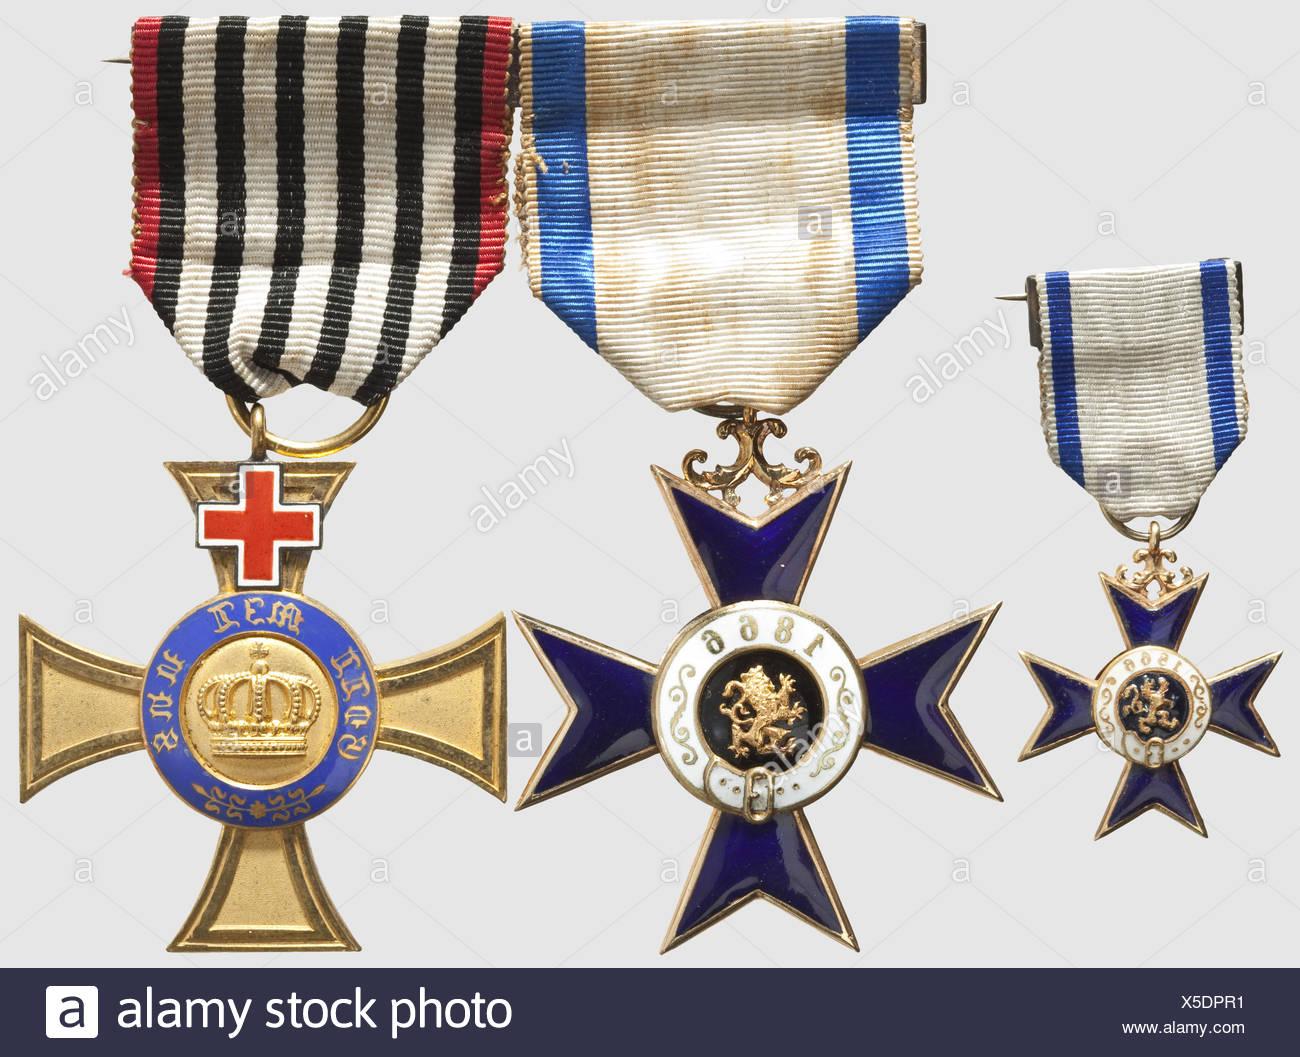 British Military Medals Stock Photos & British Military